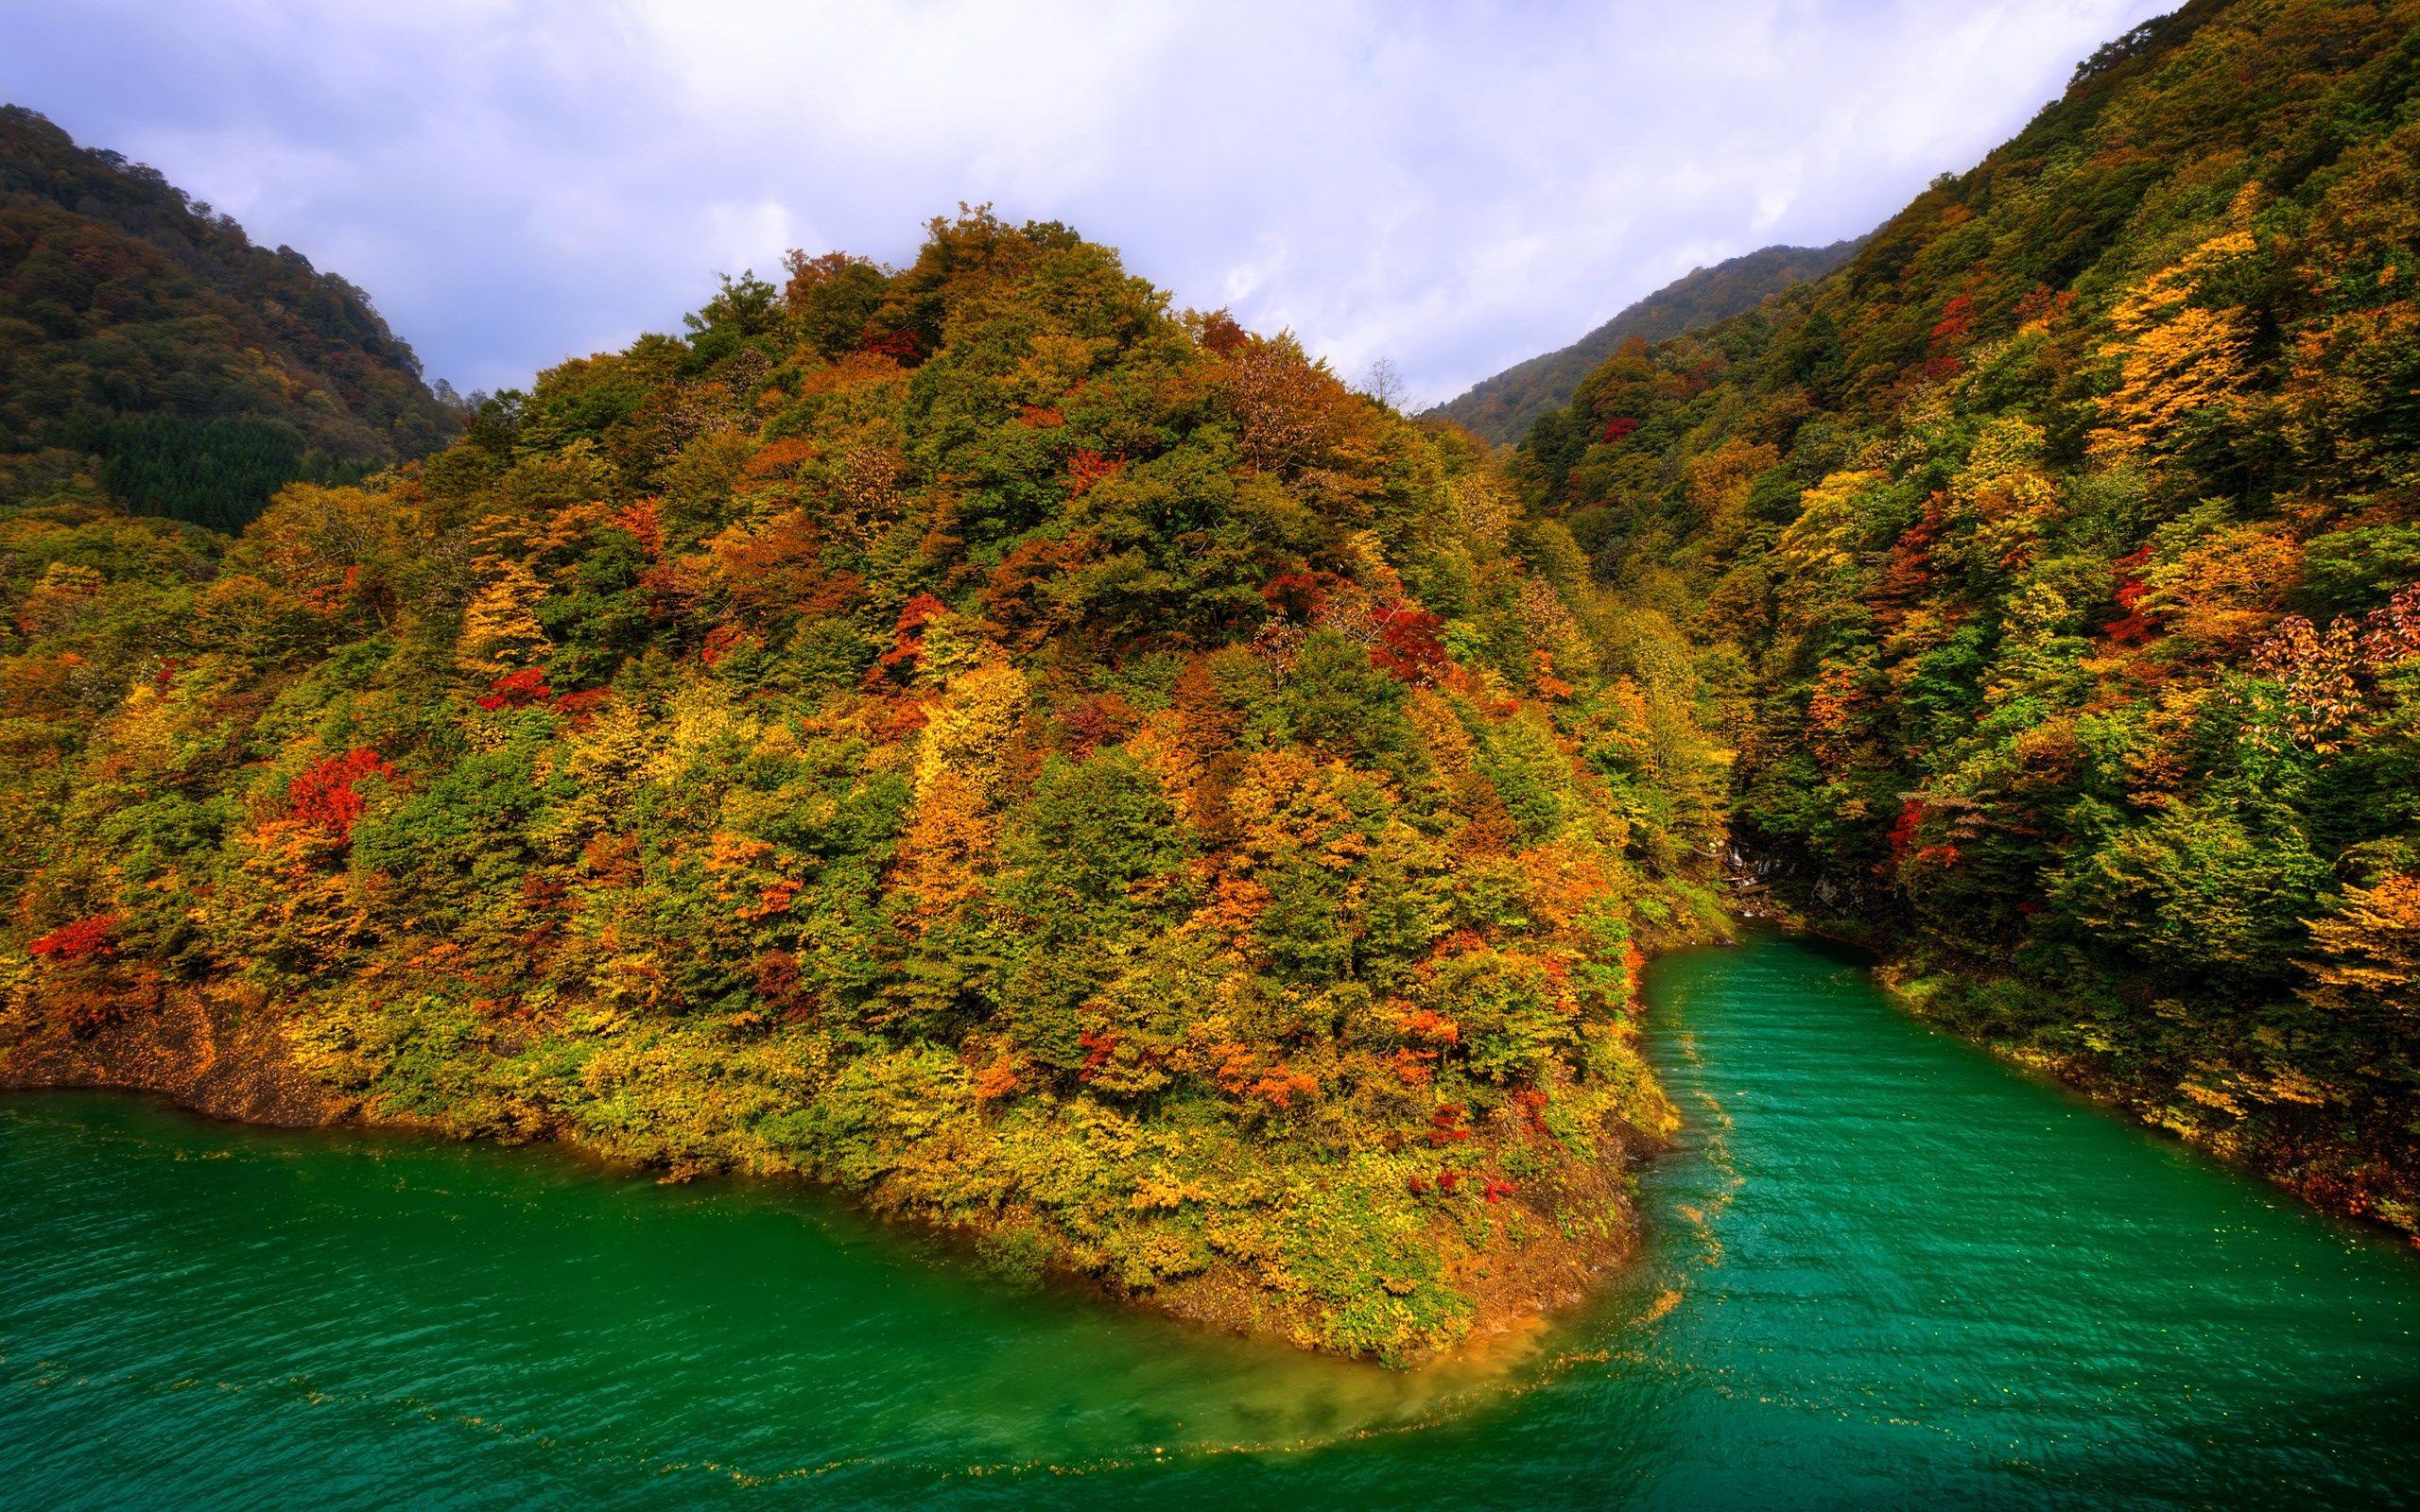 autumn mountains backgrounds. fall mountains backgrounds for desktop hd backgrounds, 2560 x 1600 (2848 kb) autumn